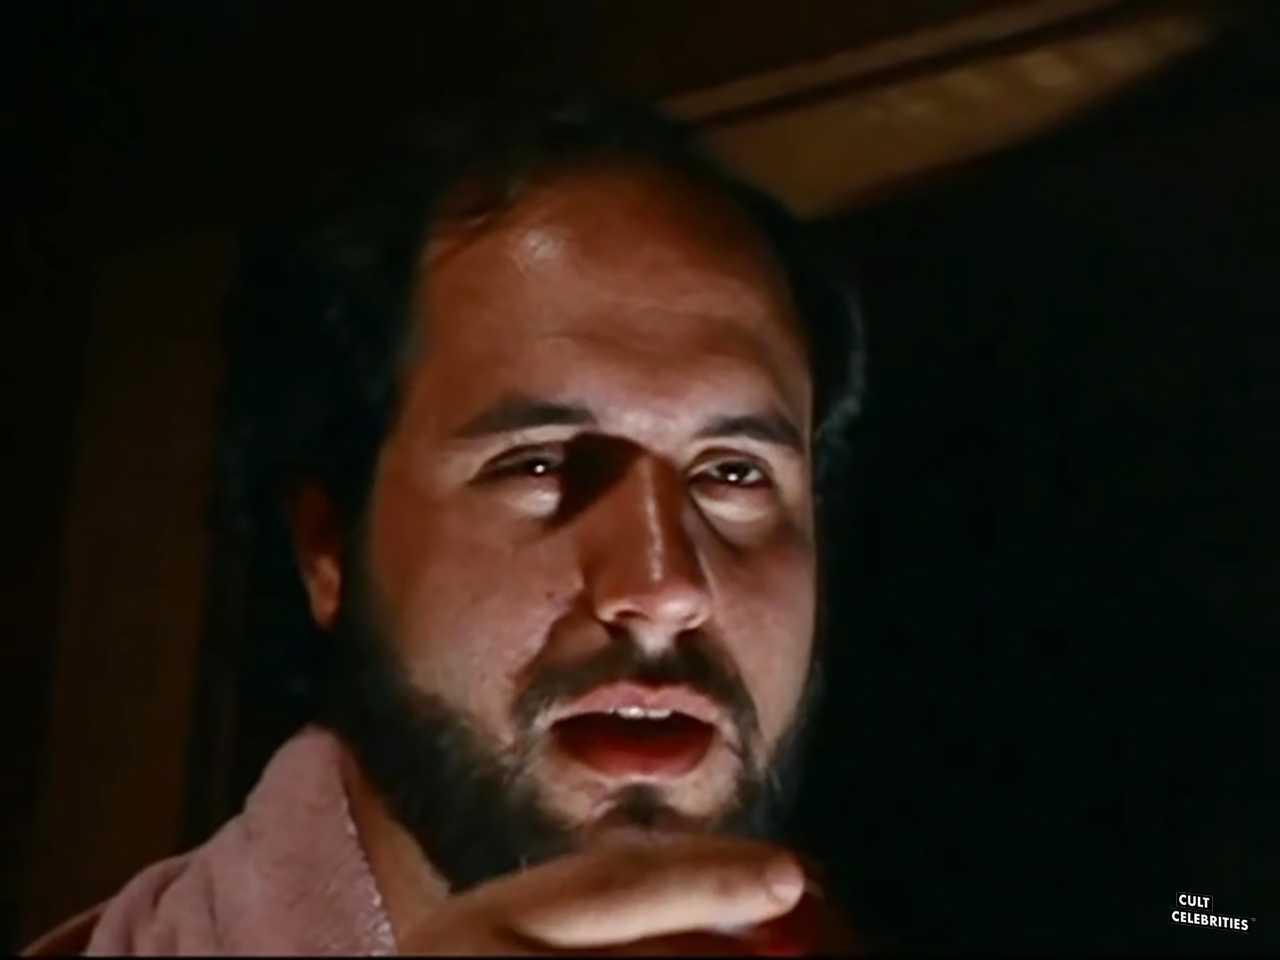 Carmine Capobianco in Psychos in Love (1987)